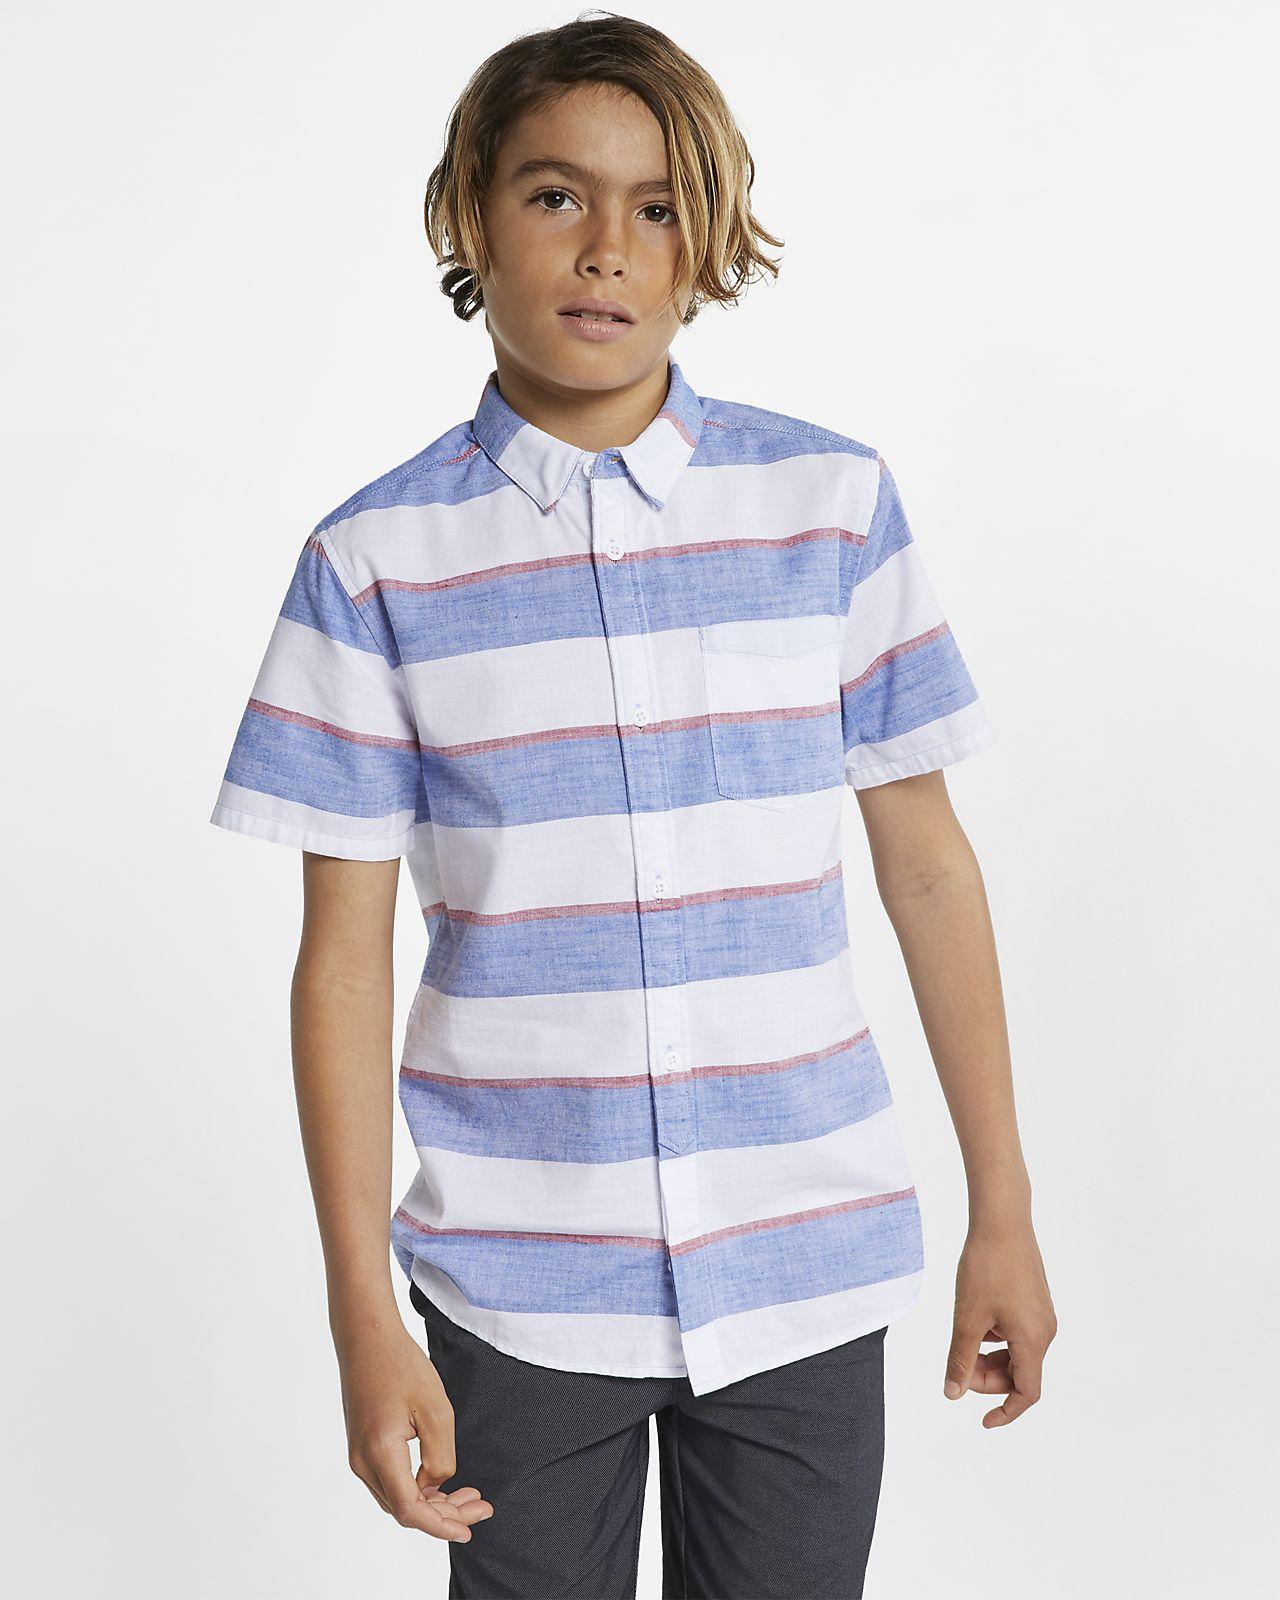 2b5ec5e9849c Αγορίστικη ριγέ μπλούζα με κουμπιά σε όλο το μήκος Hurley Blocked ...